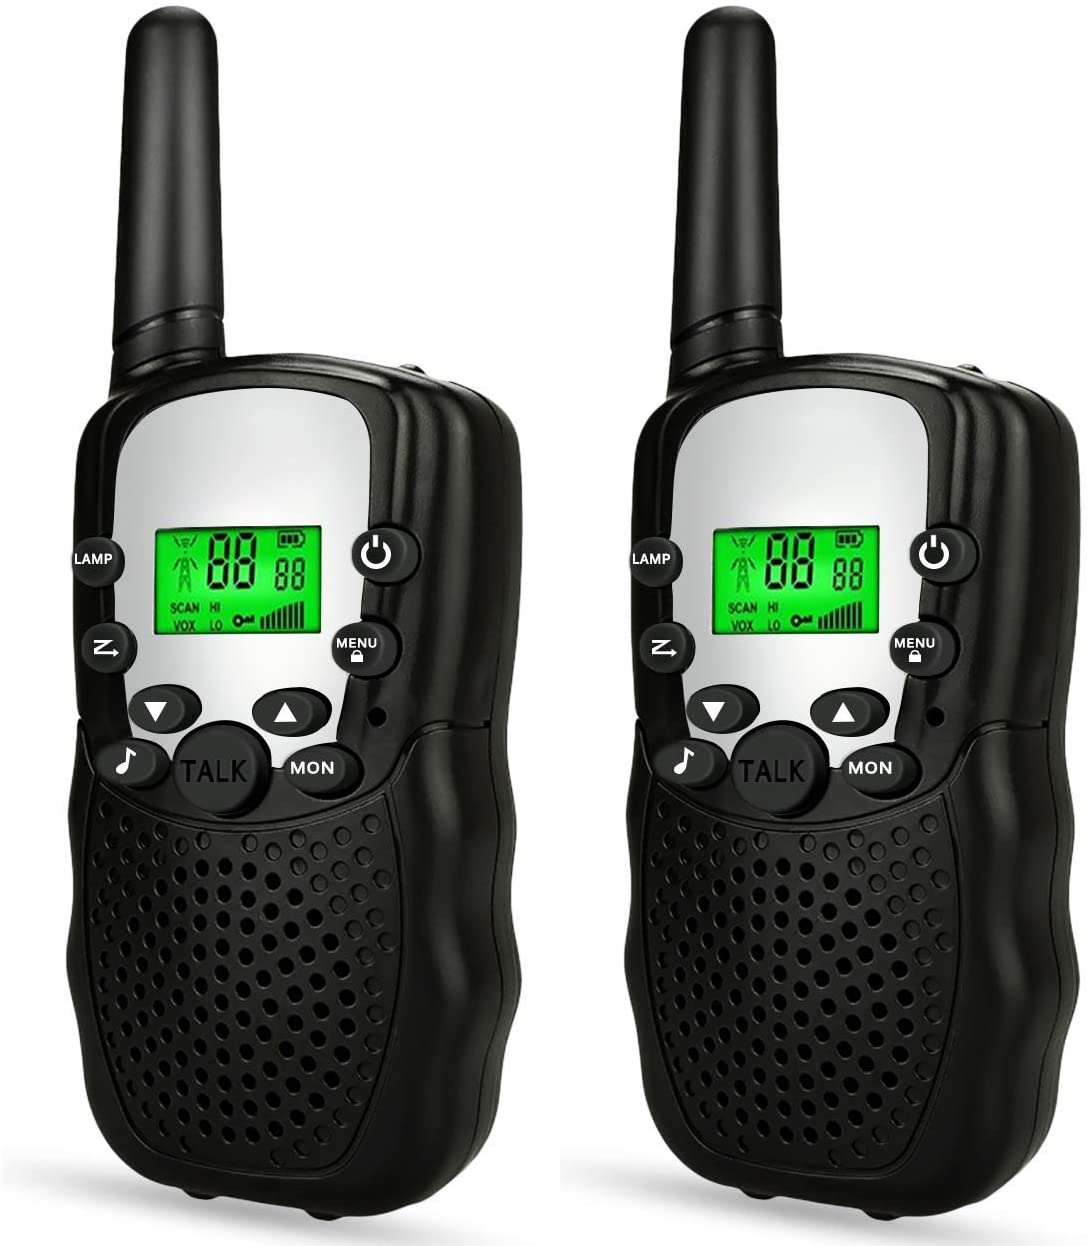 YRE Kid's Toy walkie-Talkie, Hand-held Long-Distance Radio Toy, Children's Birthday Gift Mini walkie-Talkie Outdoor Adventure Camping Trekking 2PCS,Black